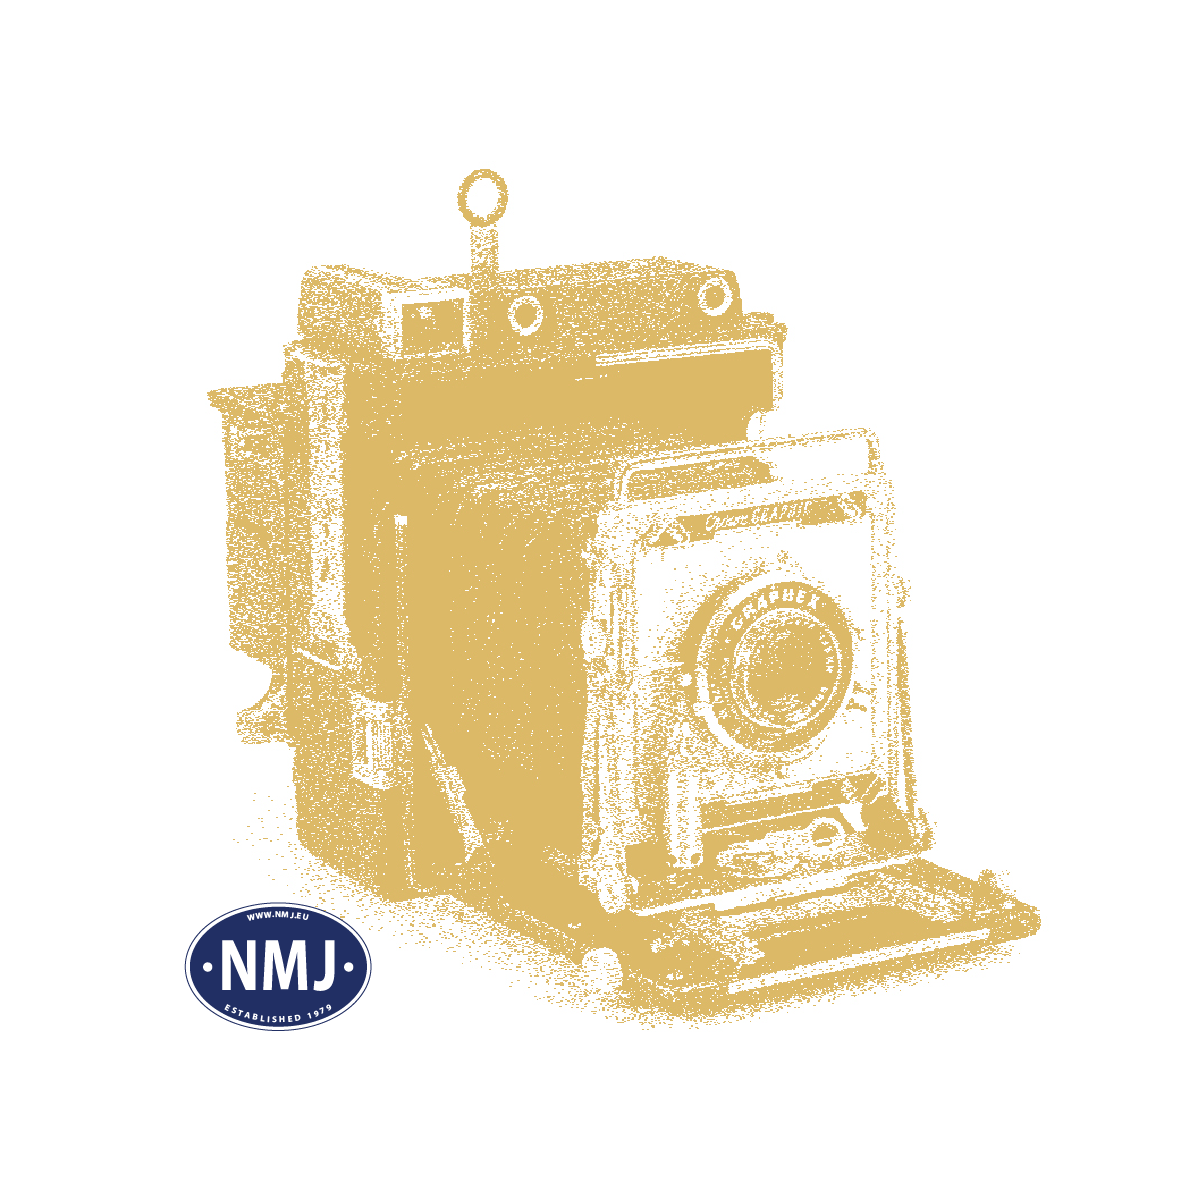 NMJT9914 - Speil for OBAS El13